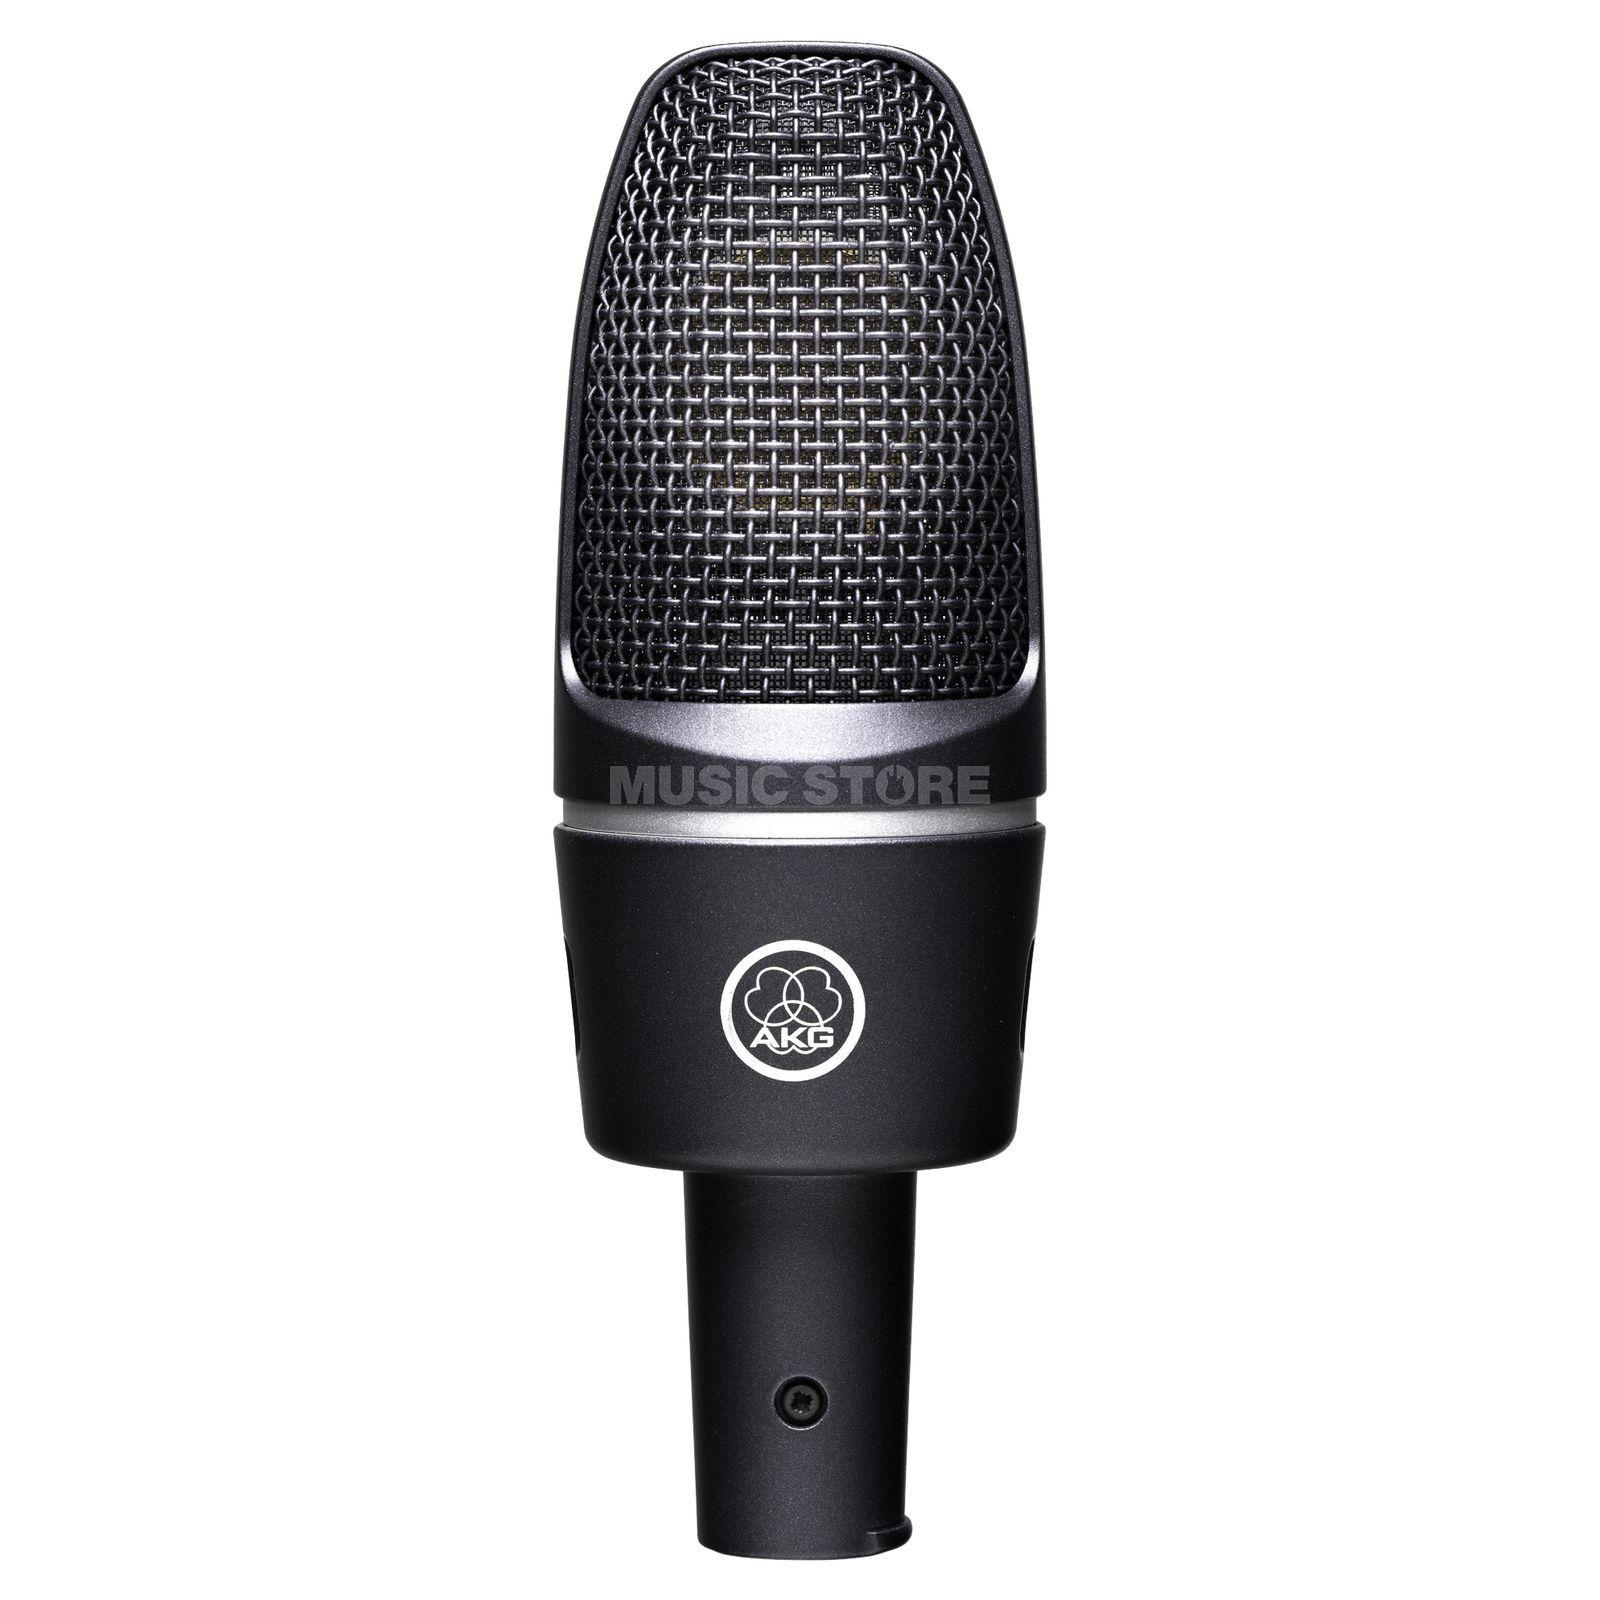 AKG C 3000 B Cardioid Condenser Microphone